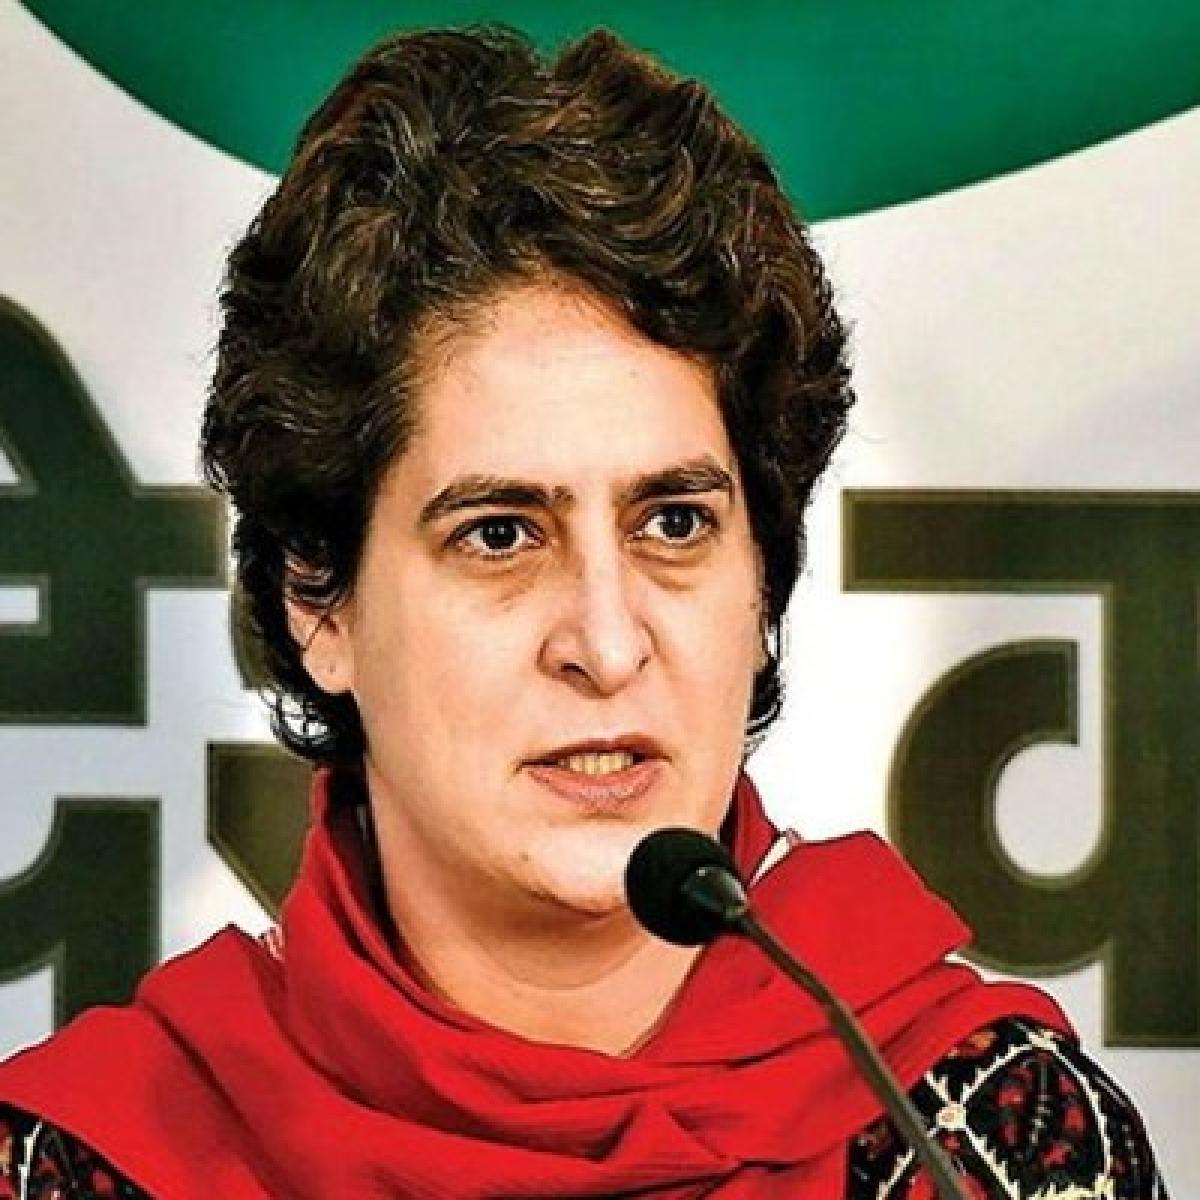 Who is spending Rs 100 cr: Priyanka Gandhi Vadra